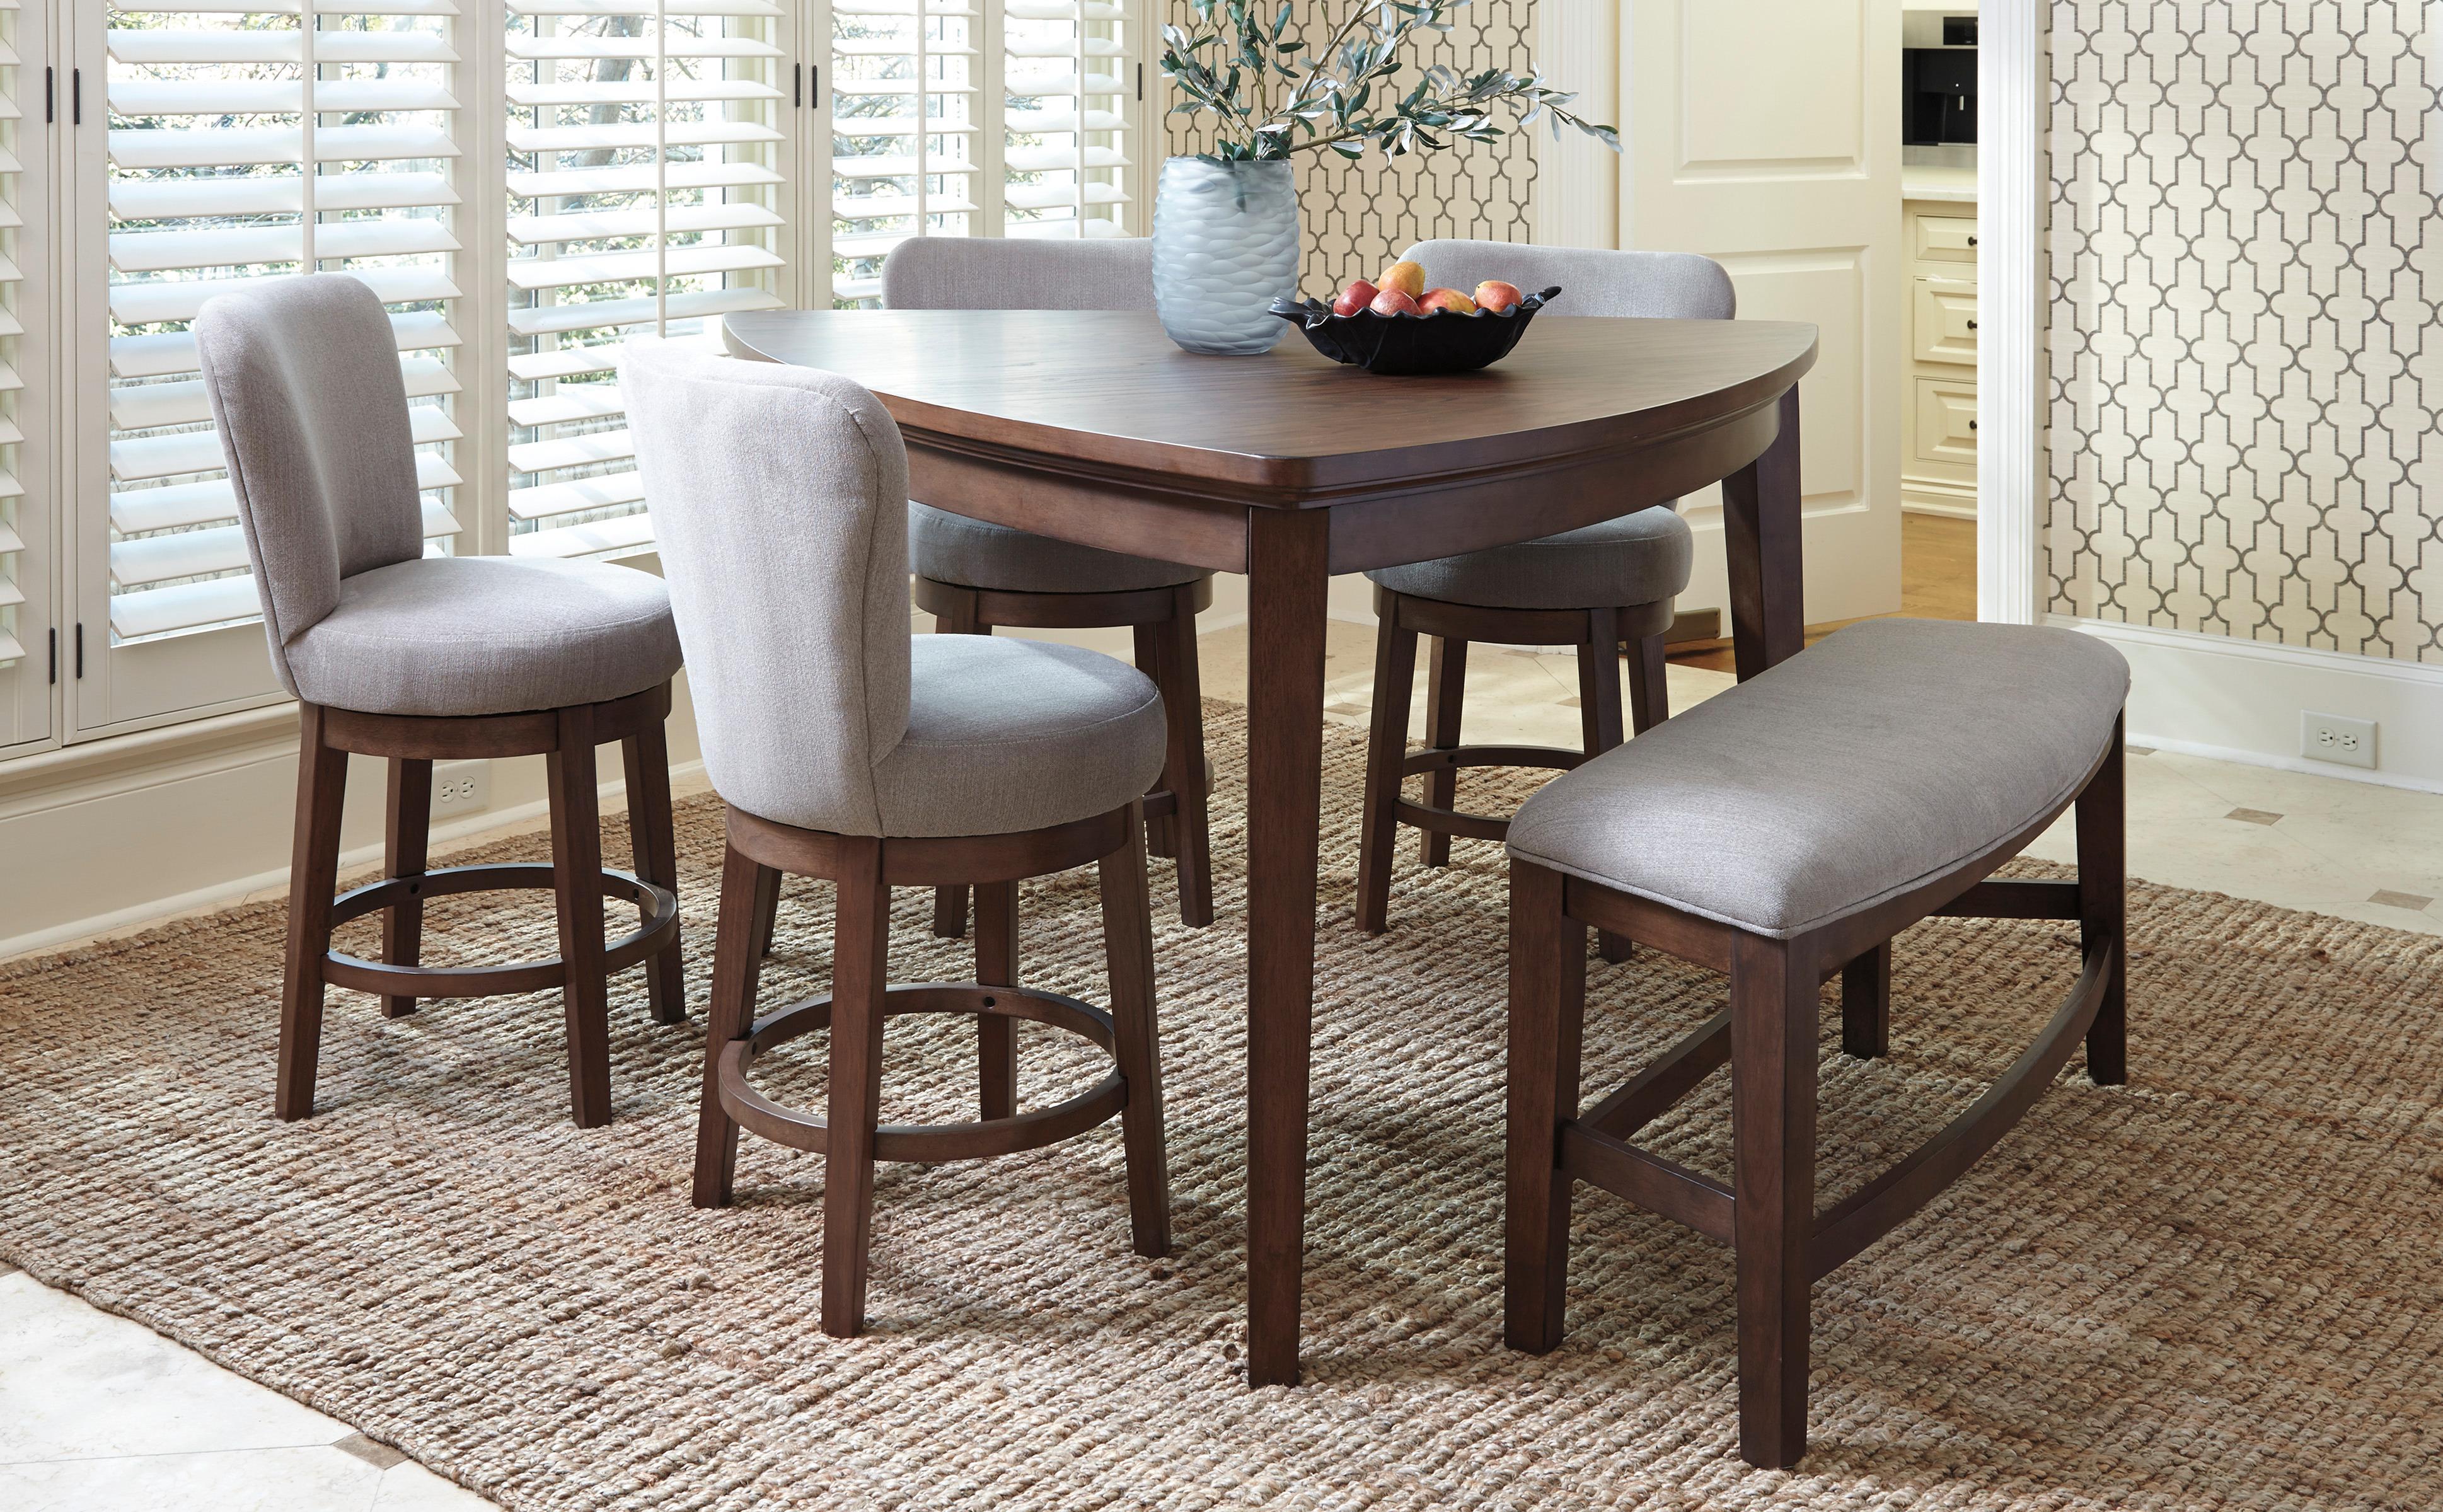 Furniture Stores Near Edwardsville Il Homestore In Edwardsville Il 62025 St Louis Leather